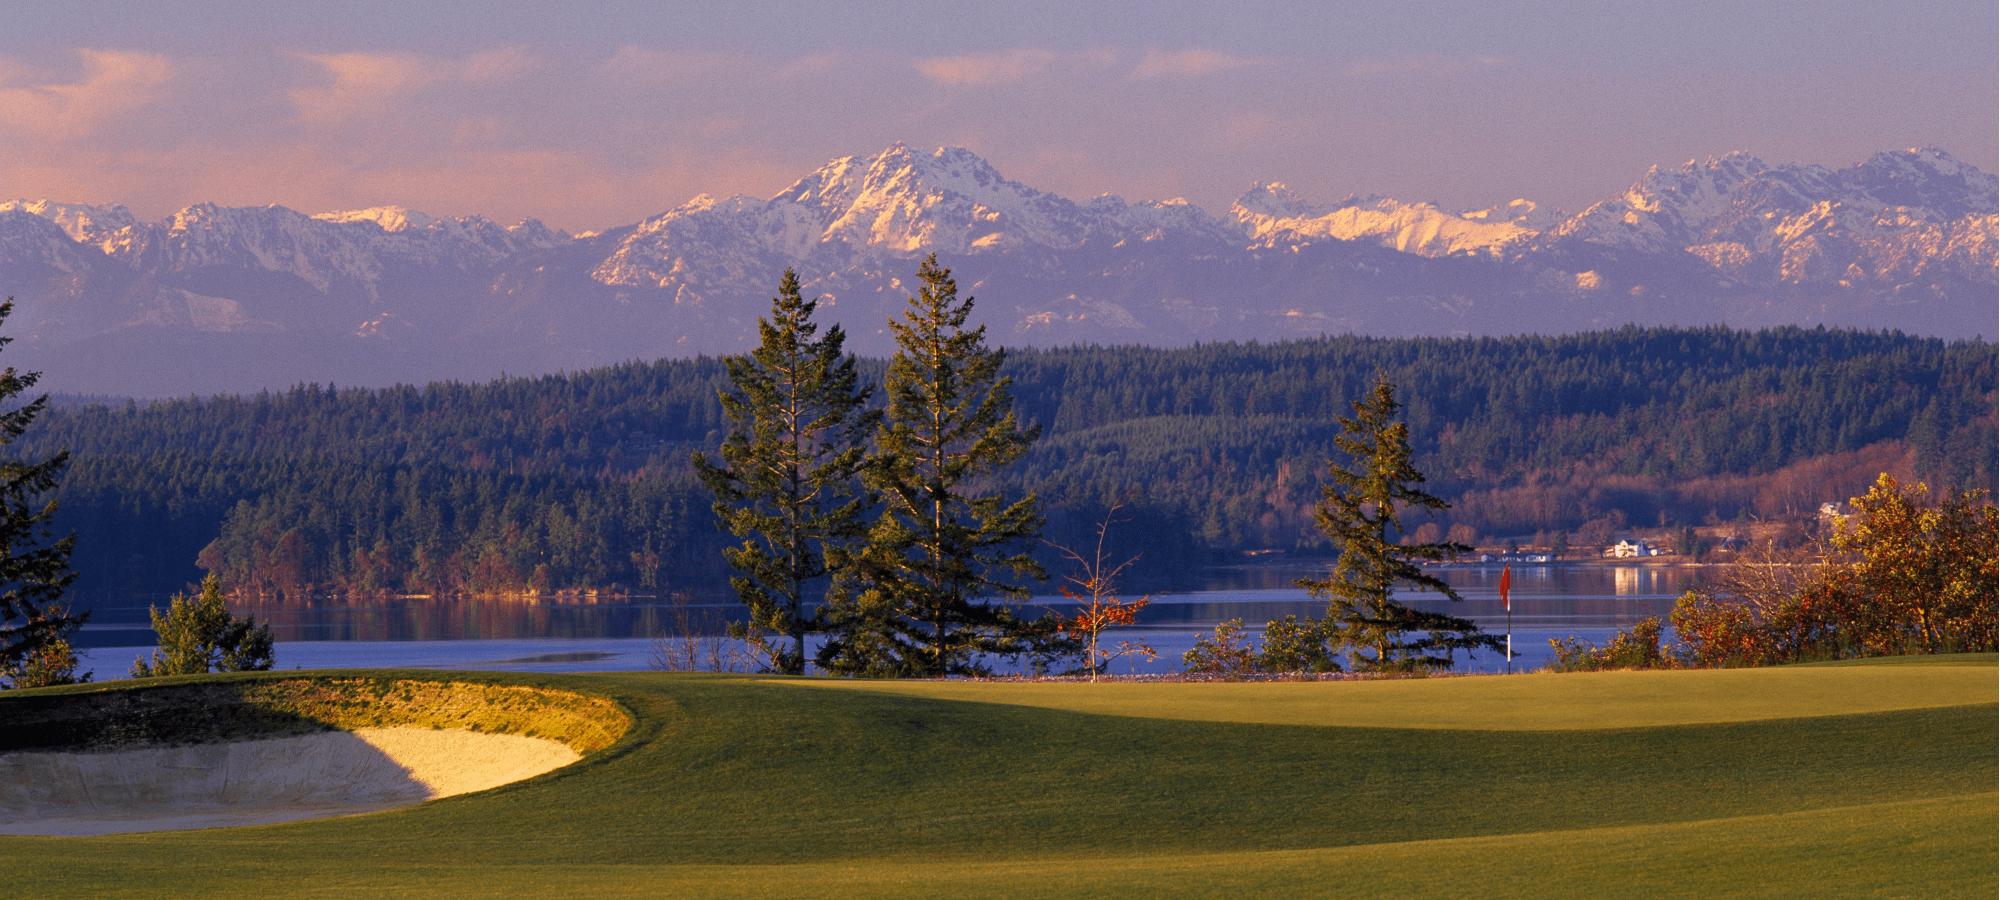 Mountain Landscape -Washington State Golf Association   Buffalo.Agency